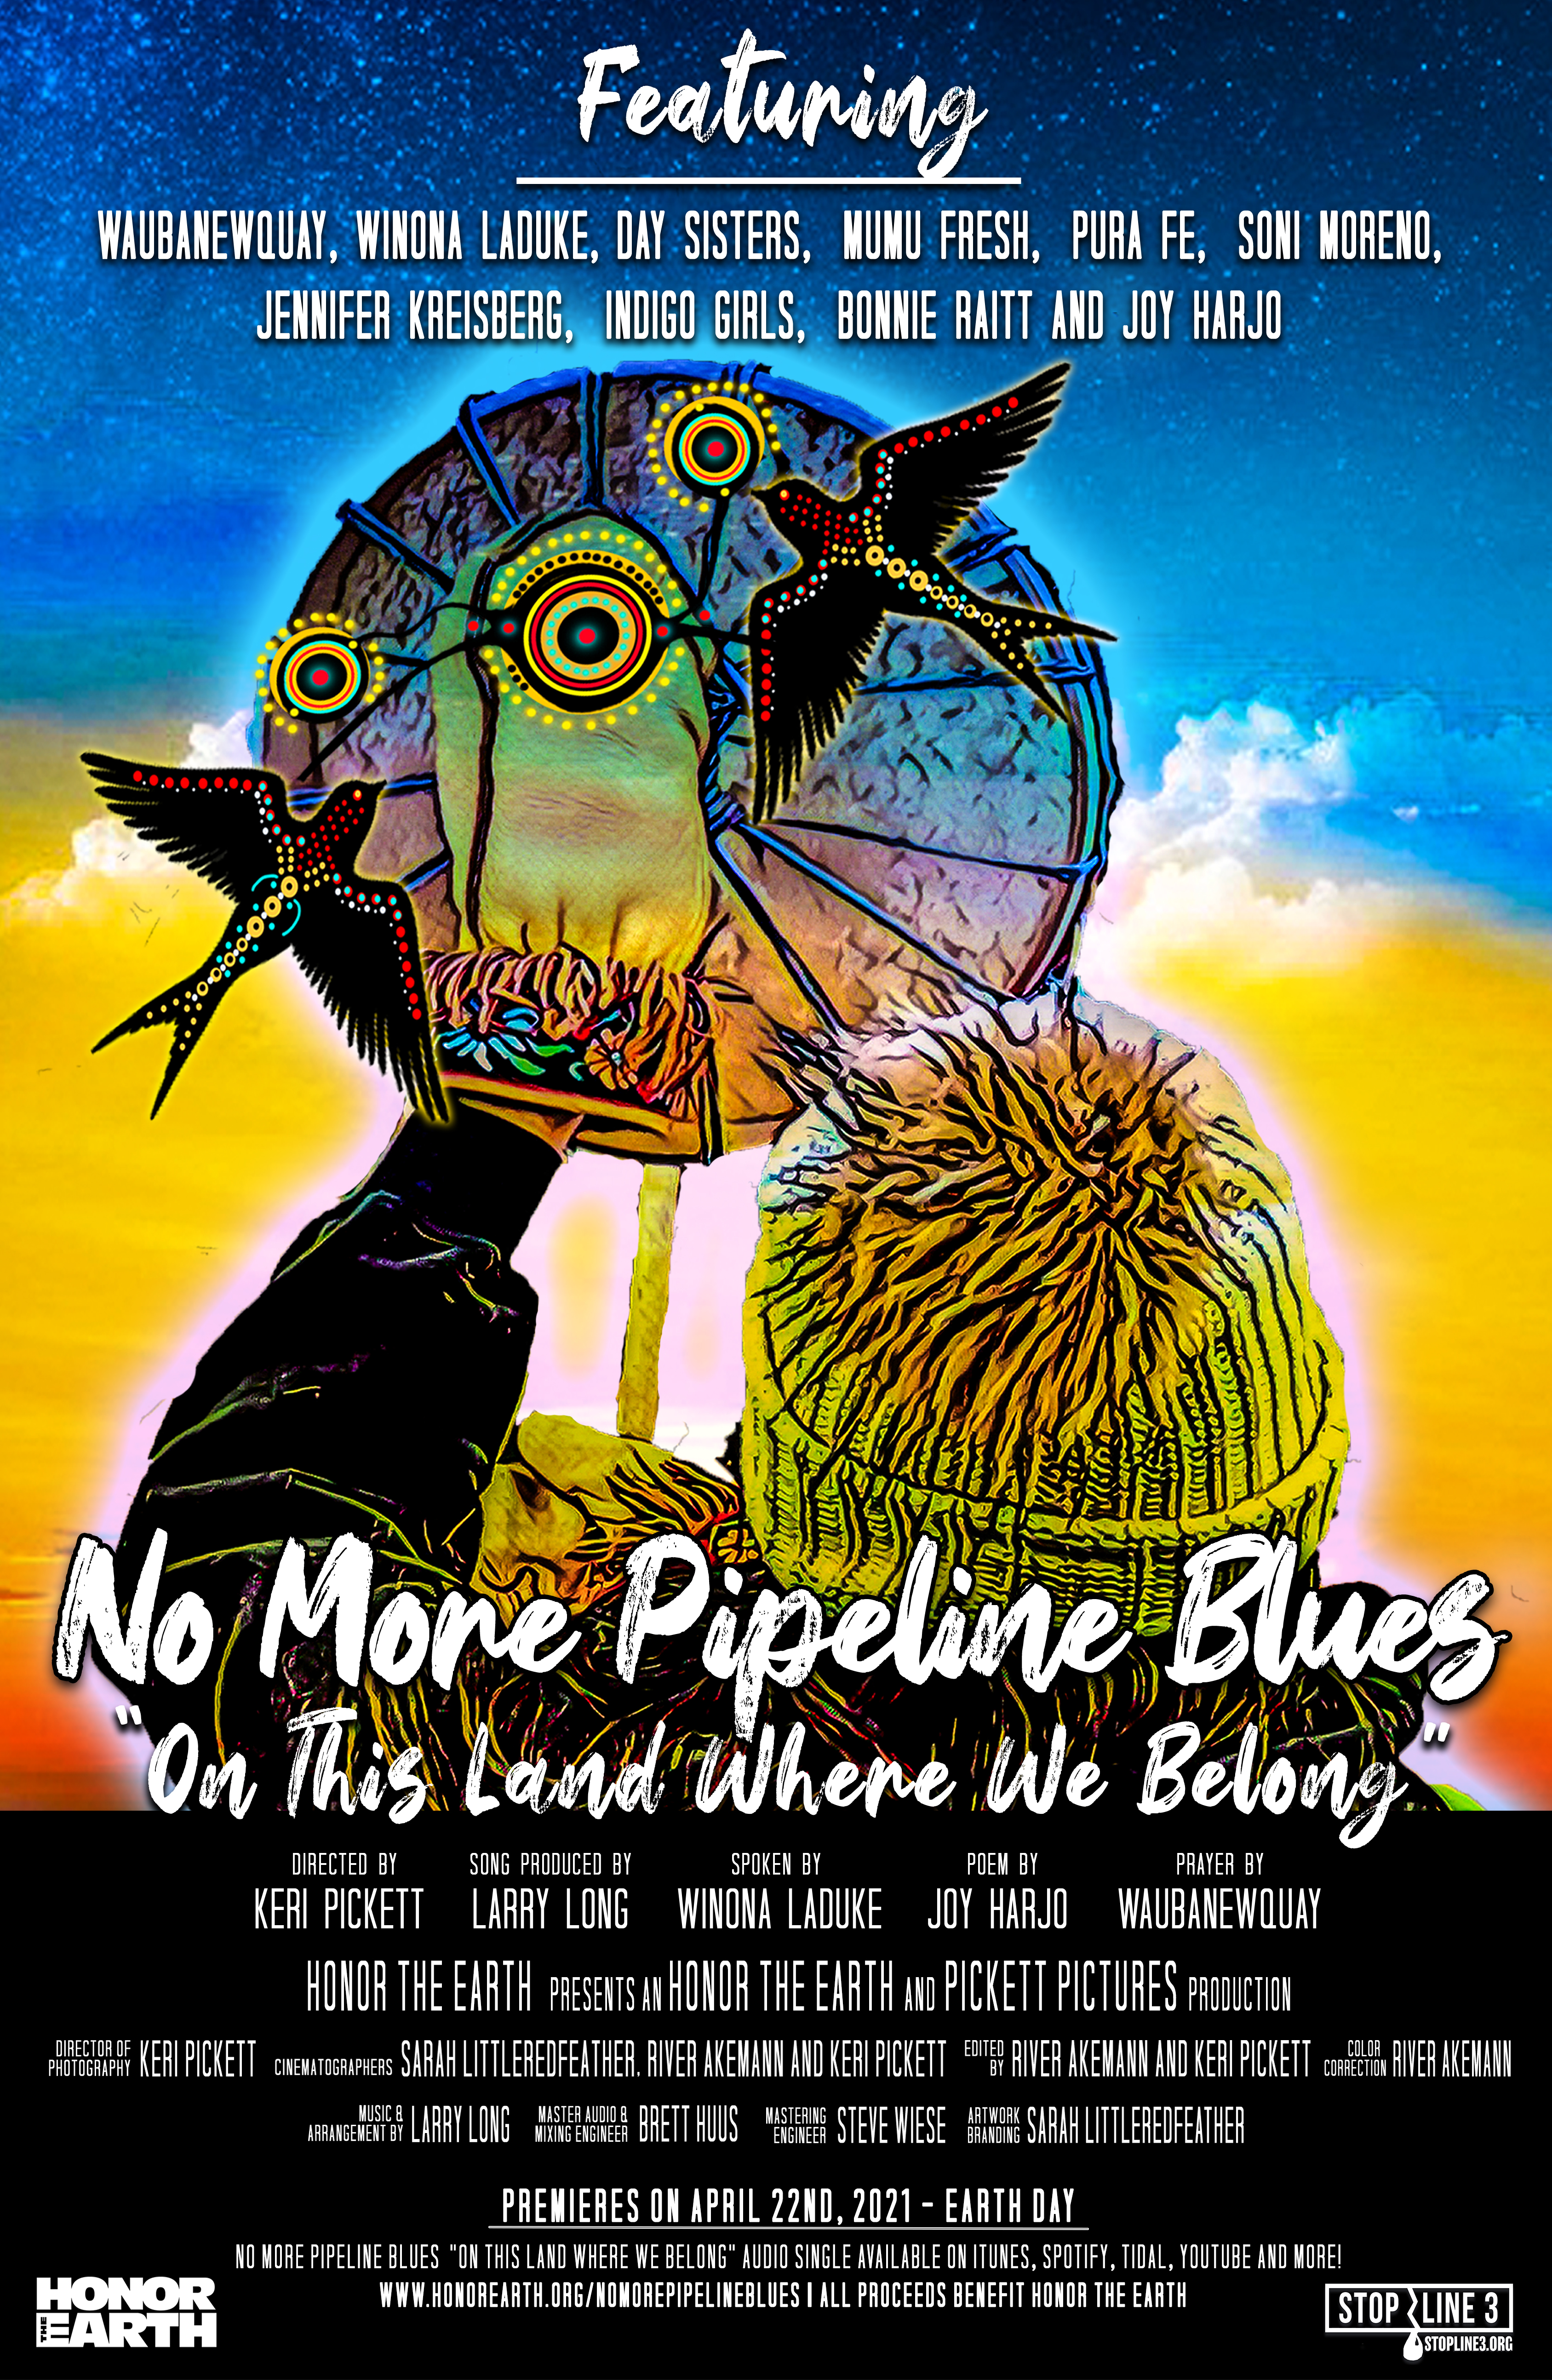 Movie_Poster_No_More_Pipeline_Blues_(edited)_copy.jpg